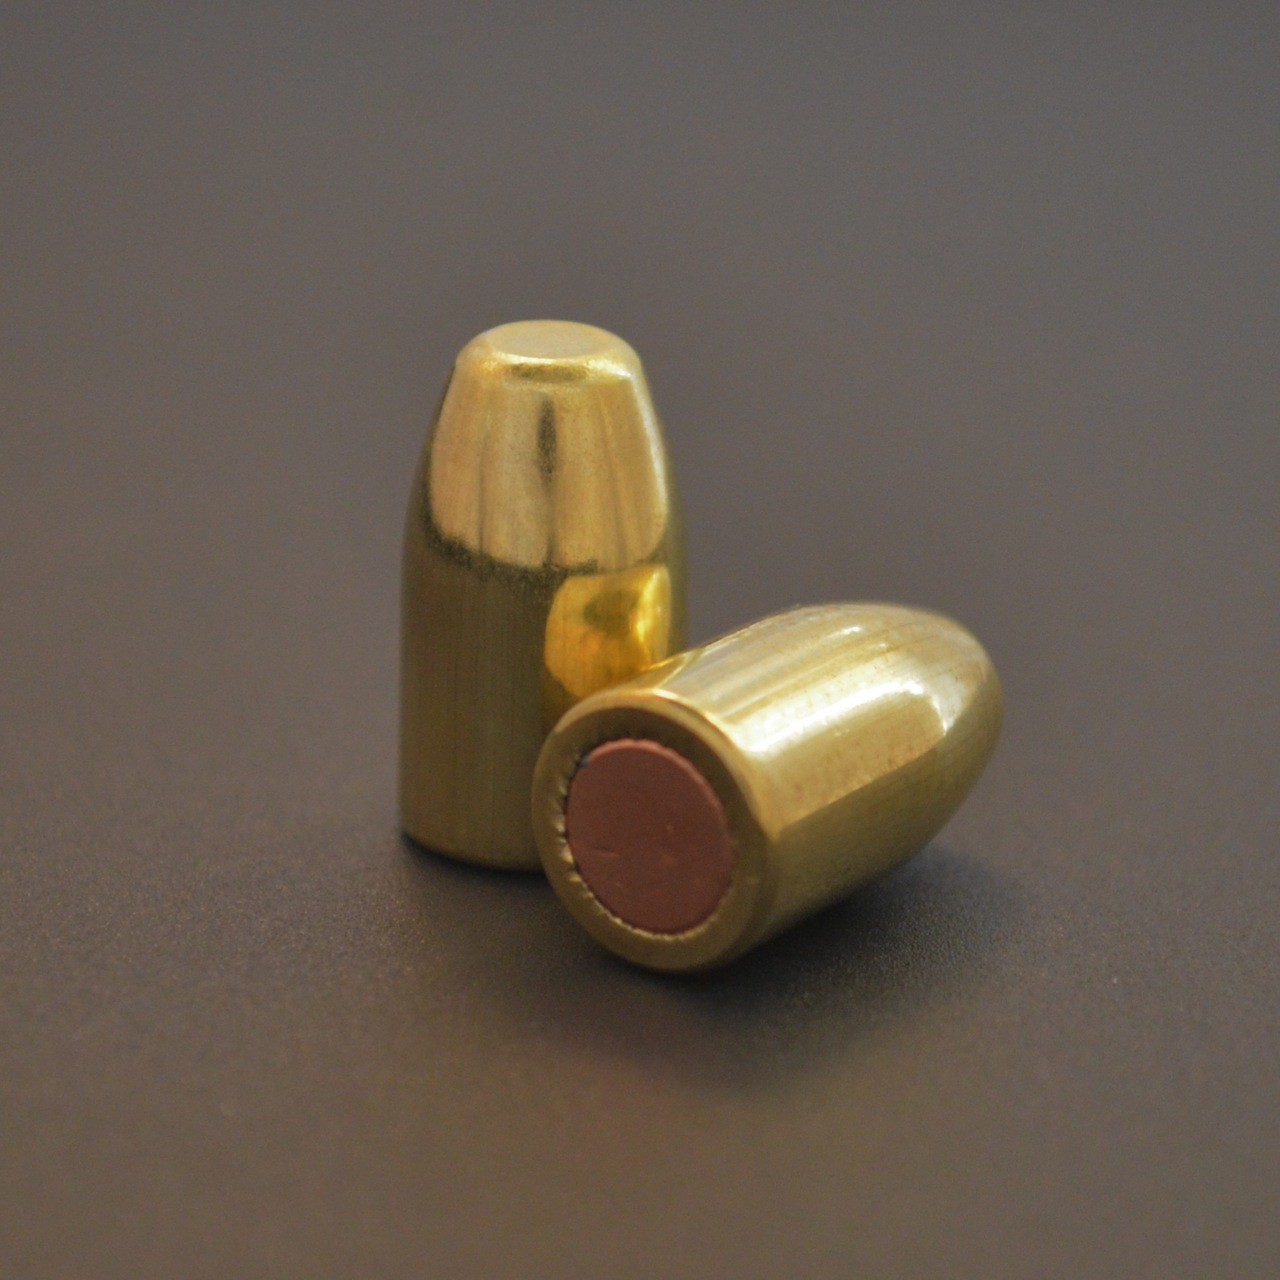 9mm/147gr CMJ - 500ct